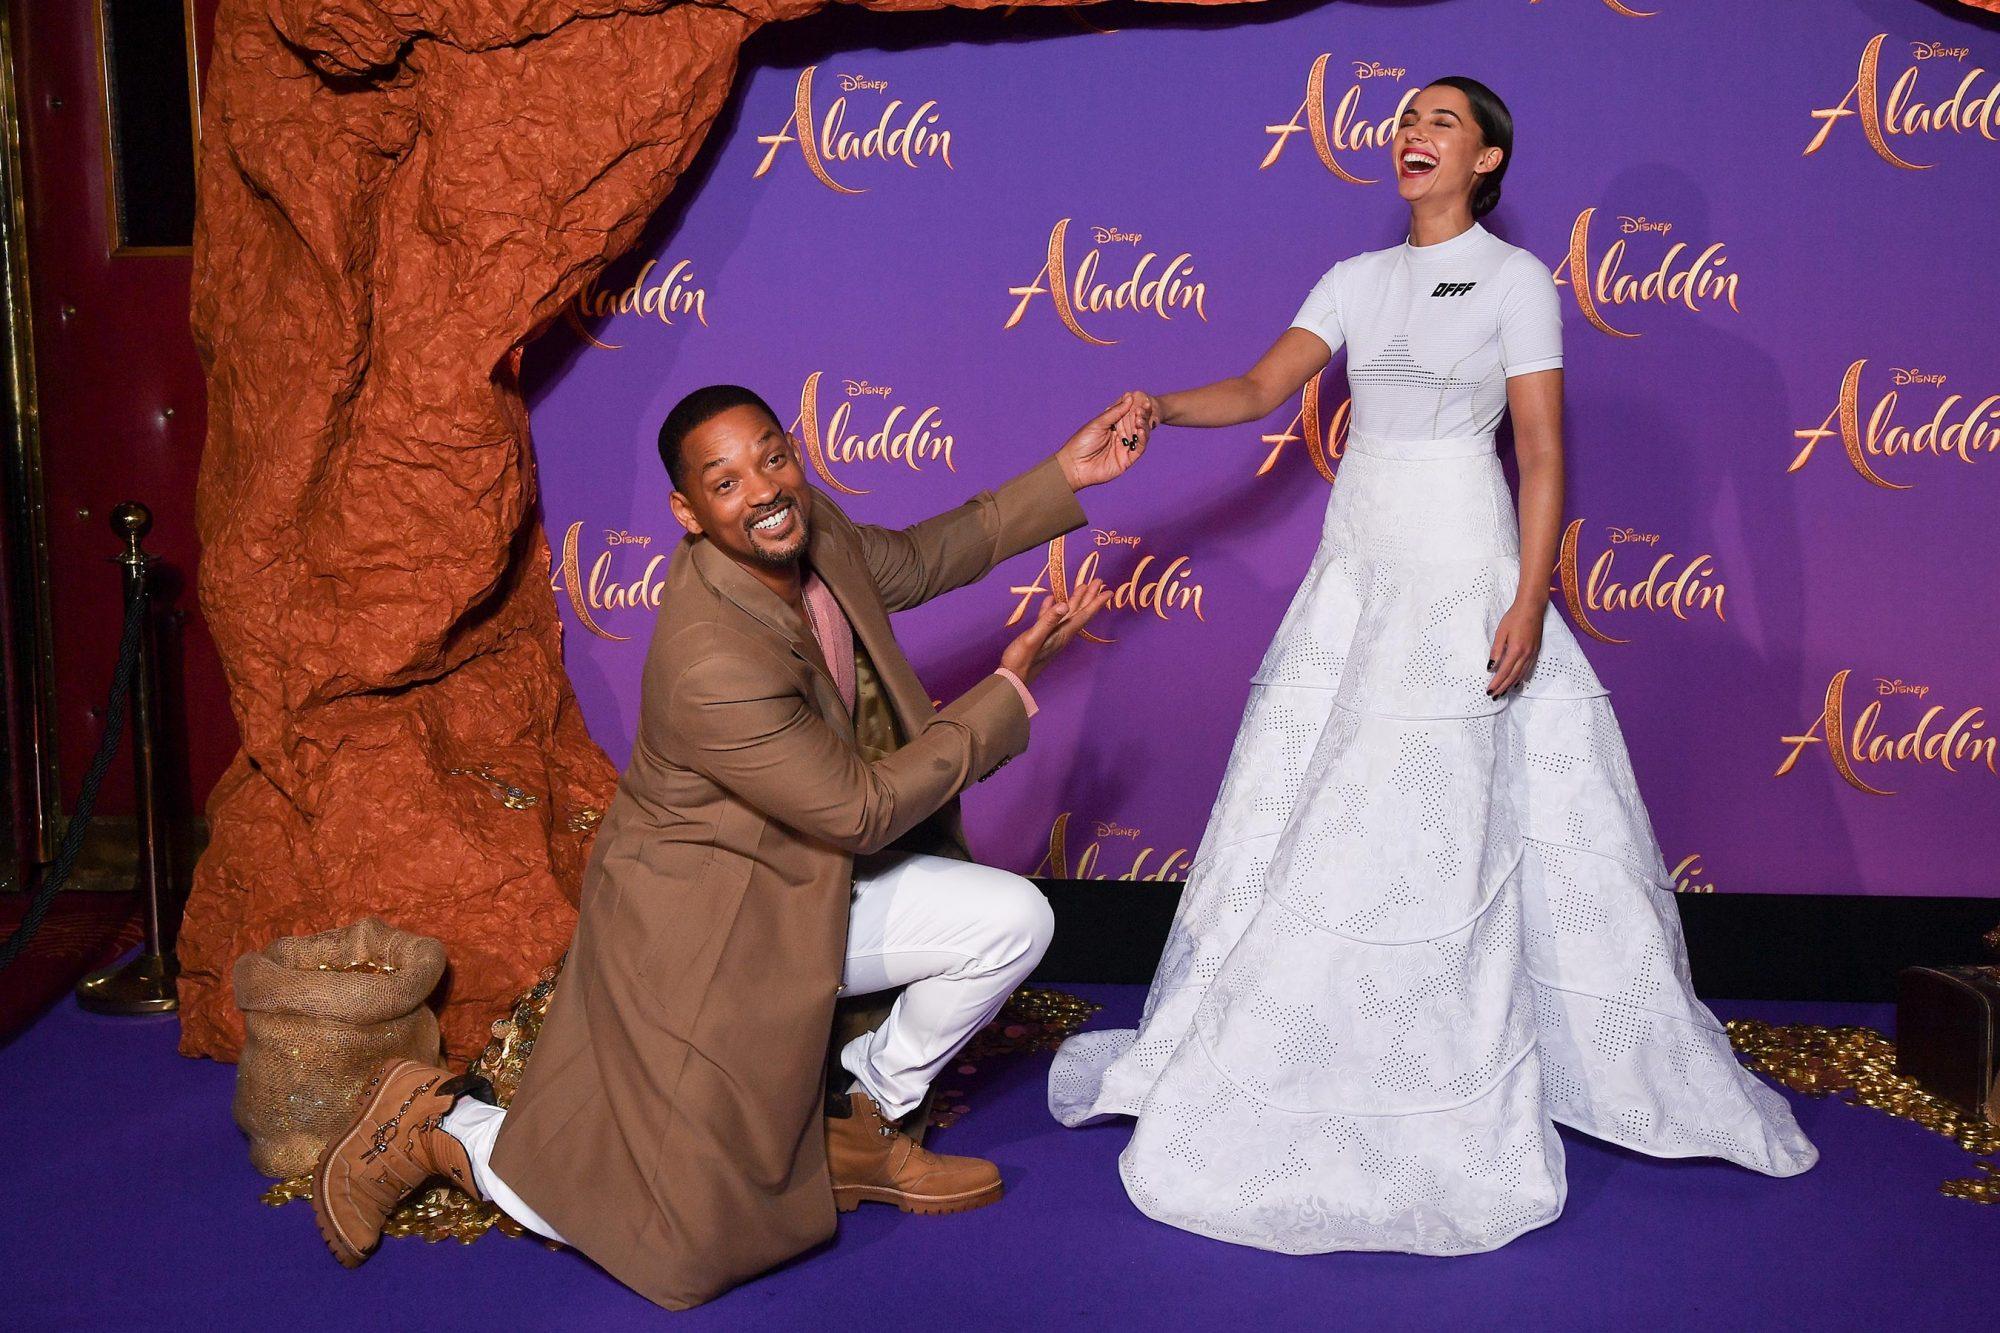 """Aladdin"" Paris Gala Screening : Photocall At Le Grand Rex In Paris"